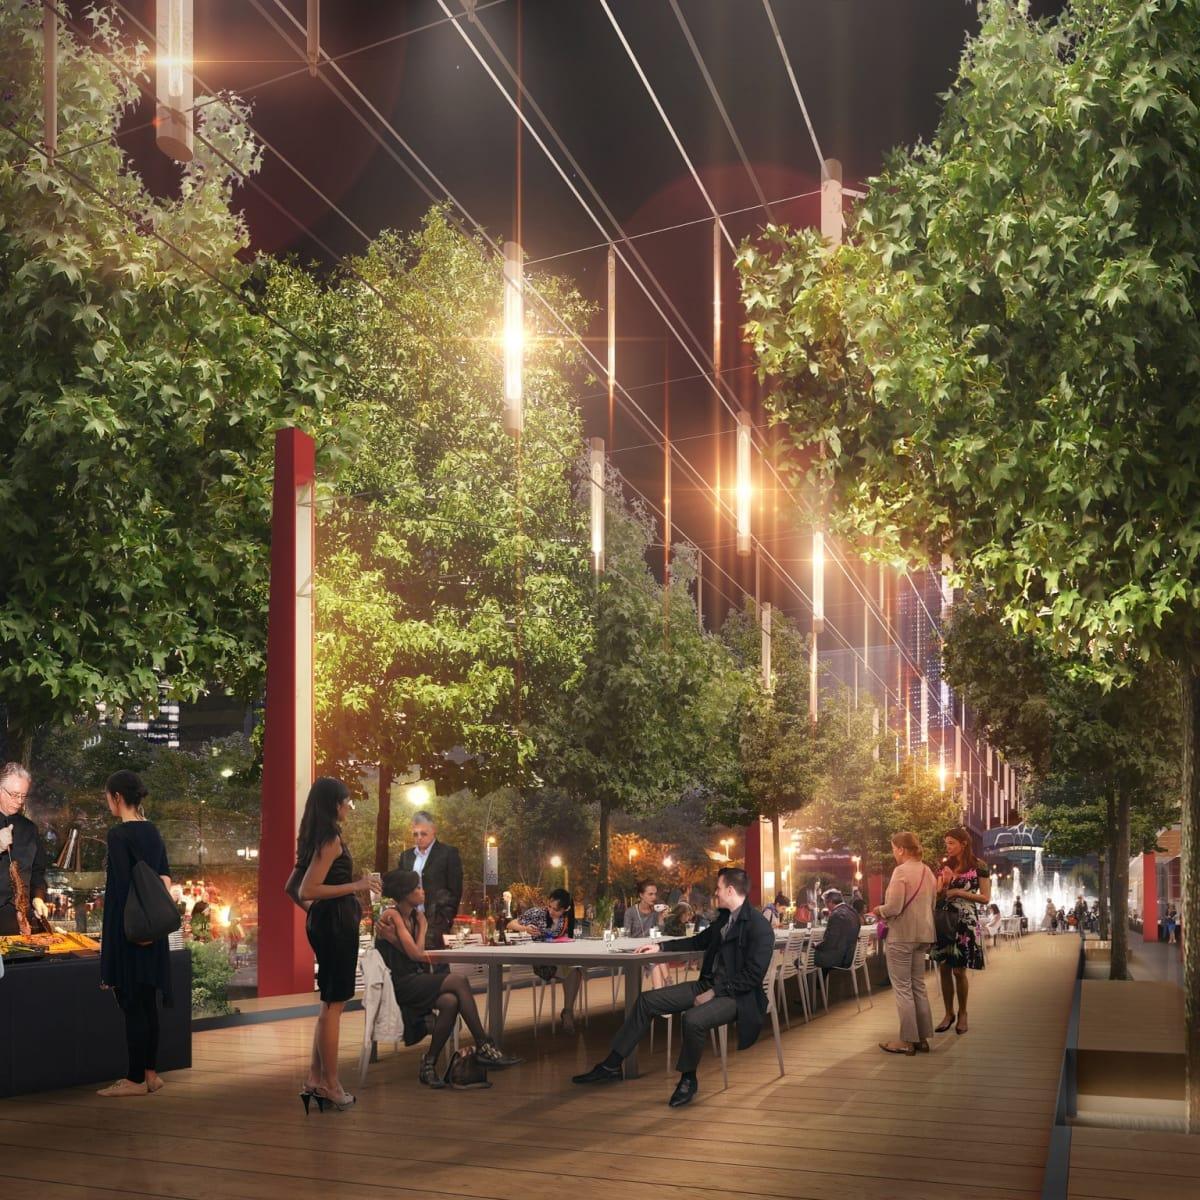 The Warf Avenida Houston rendering